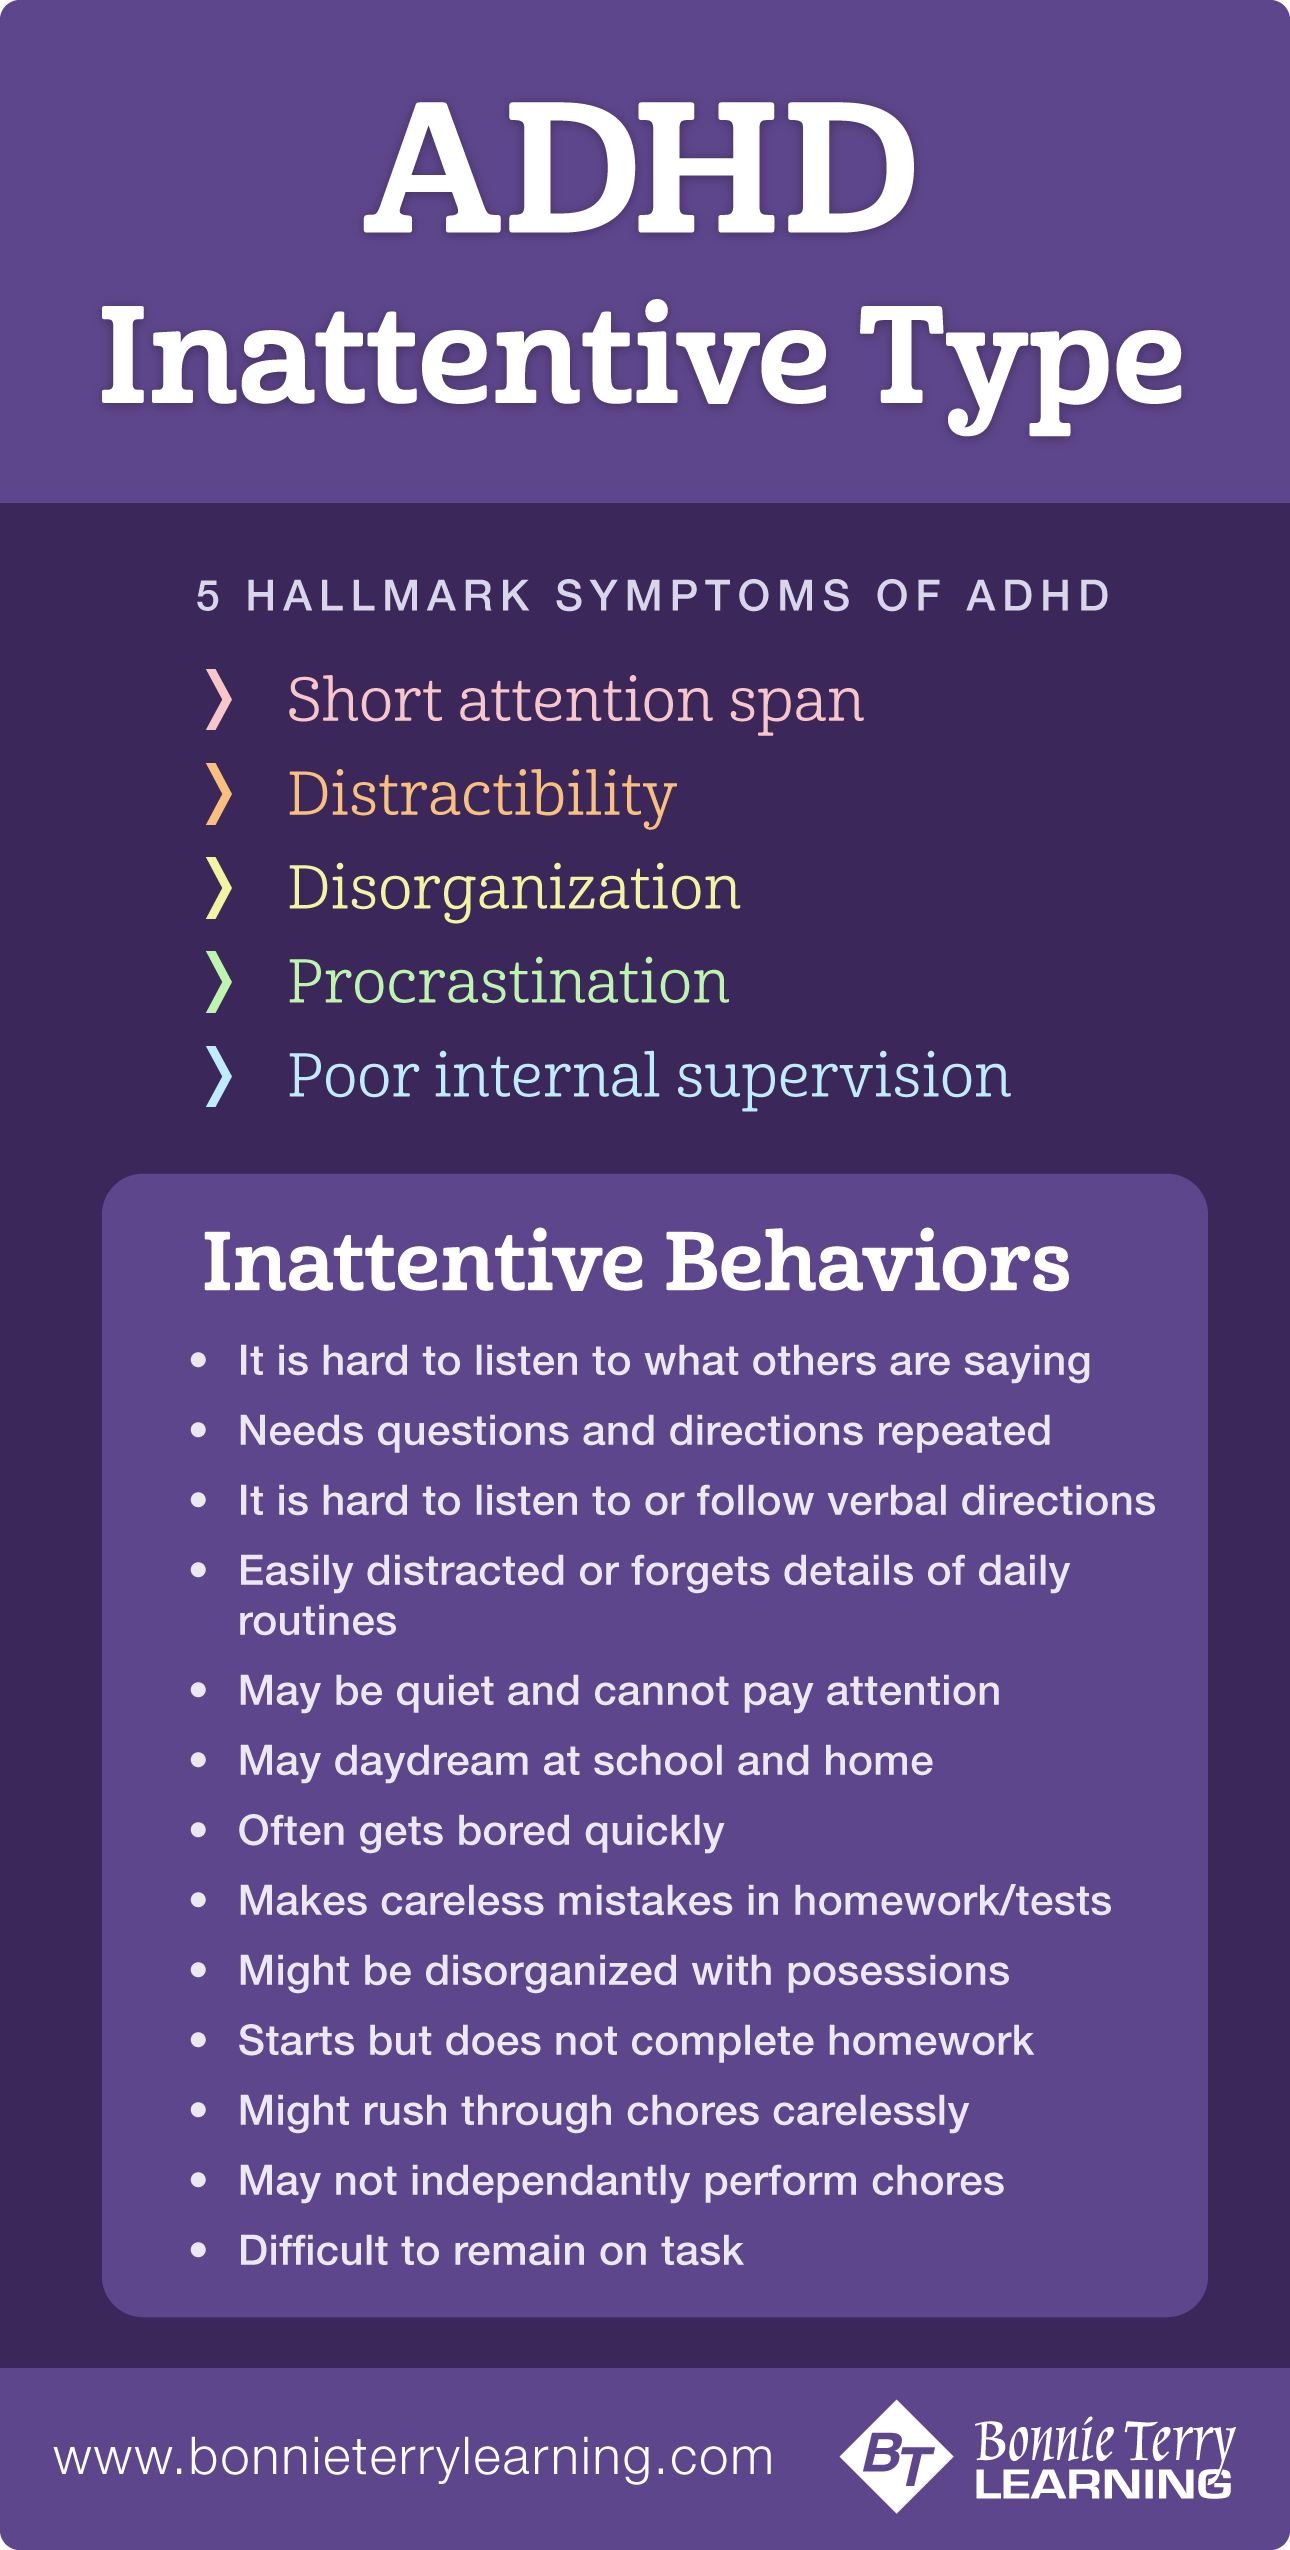 ADHD Inattentive Type